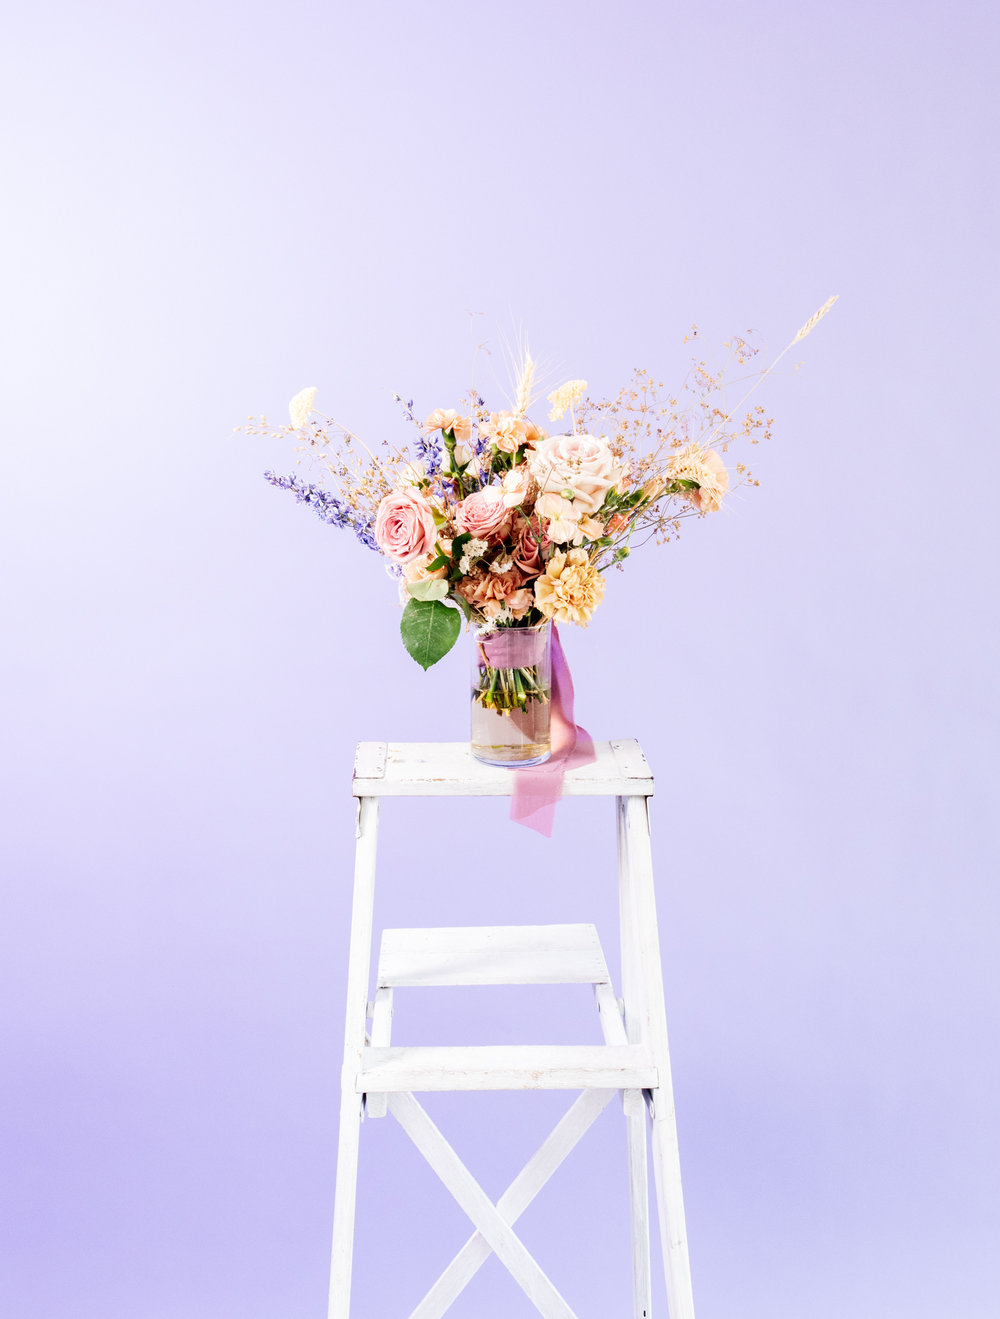 SamErica Studios - Lavender Lemonade Modern Bridal Editorial -6.jpg